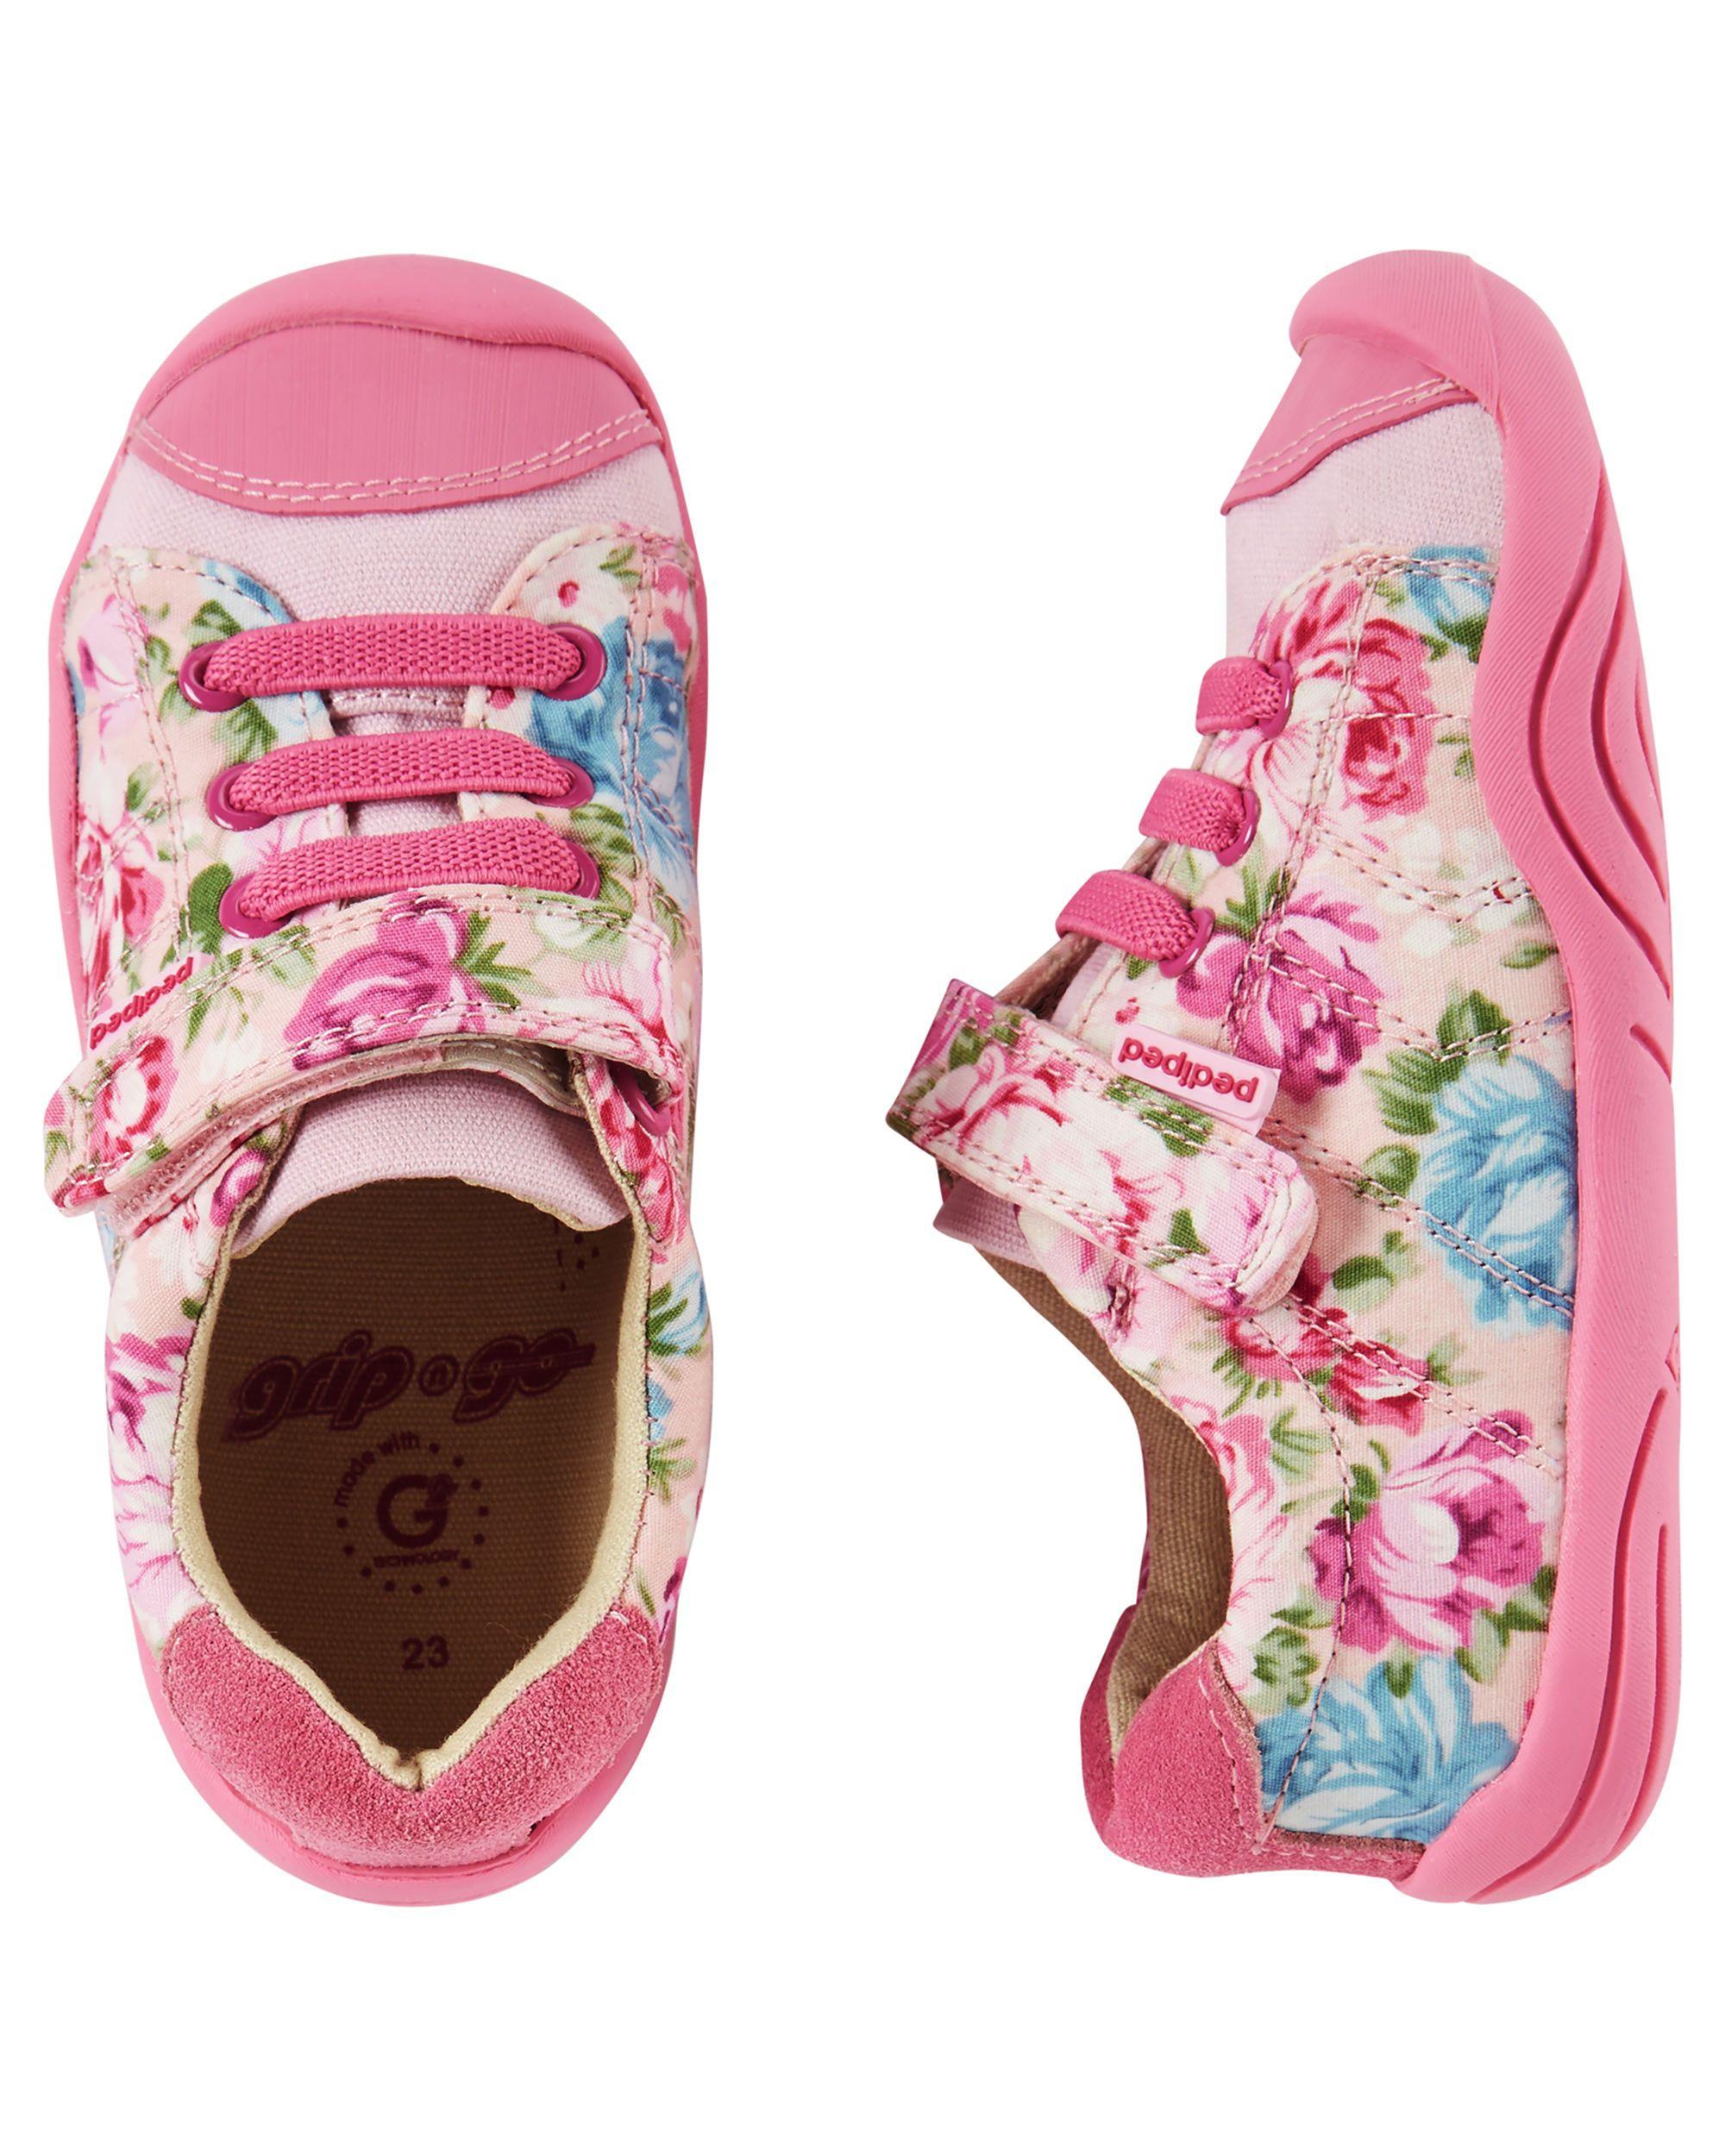 Pediped Grip n Go Jake Pink Floral